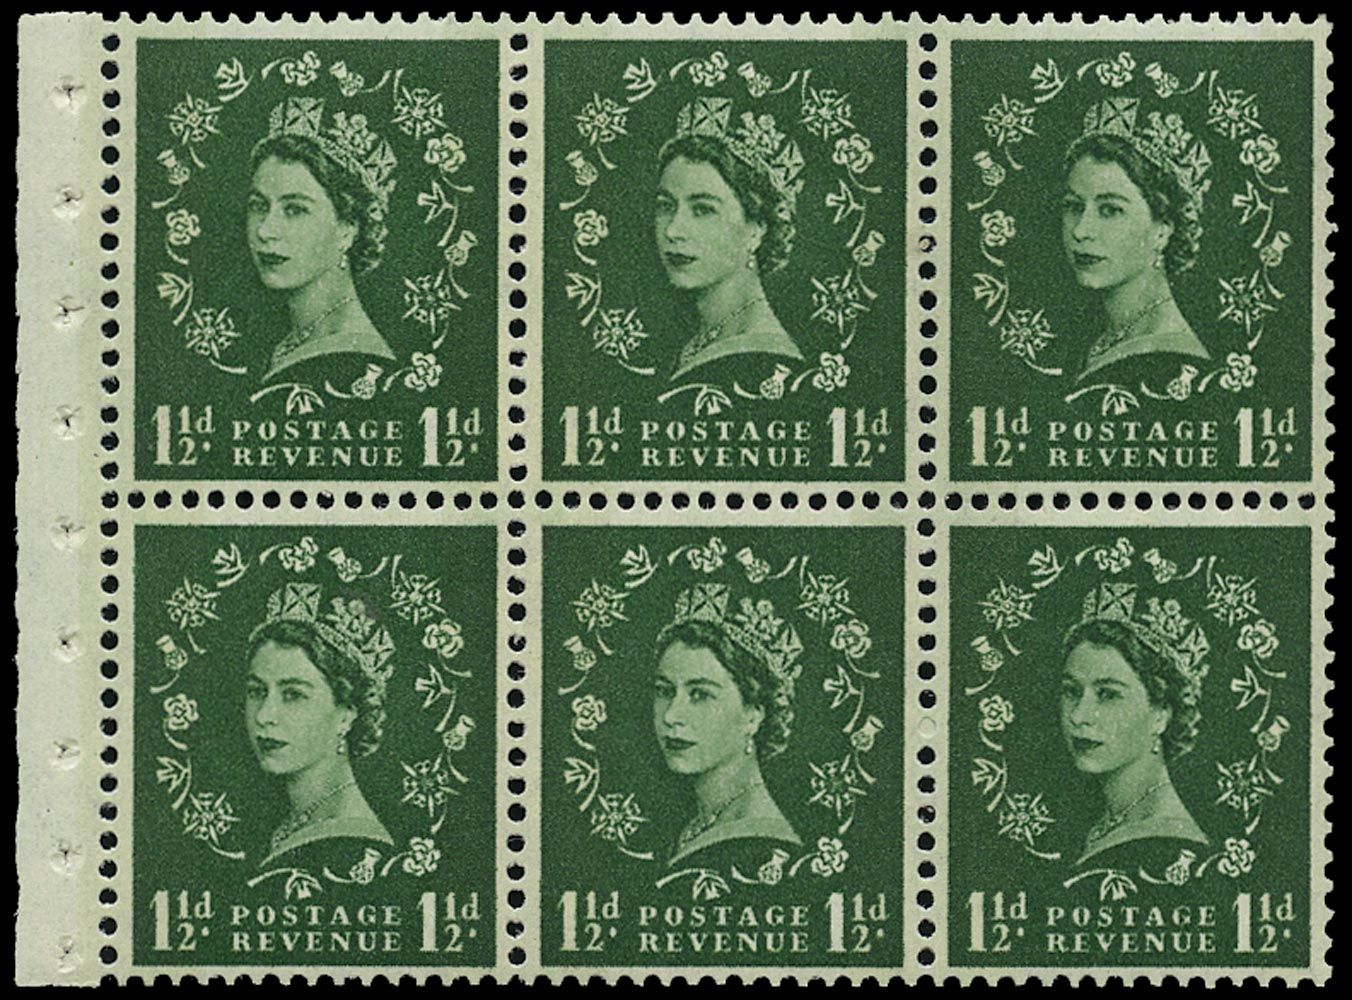 GB 1961  SG612l Booklet pane - Wmk. Crowns, Blue Phosphor